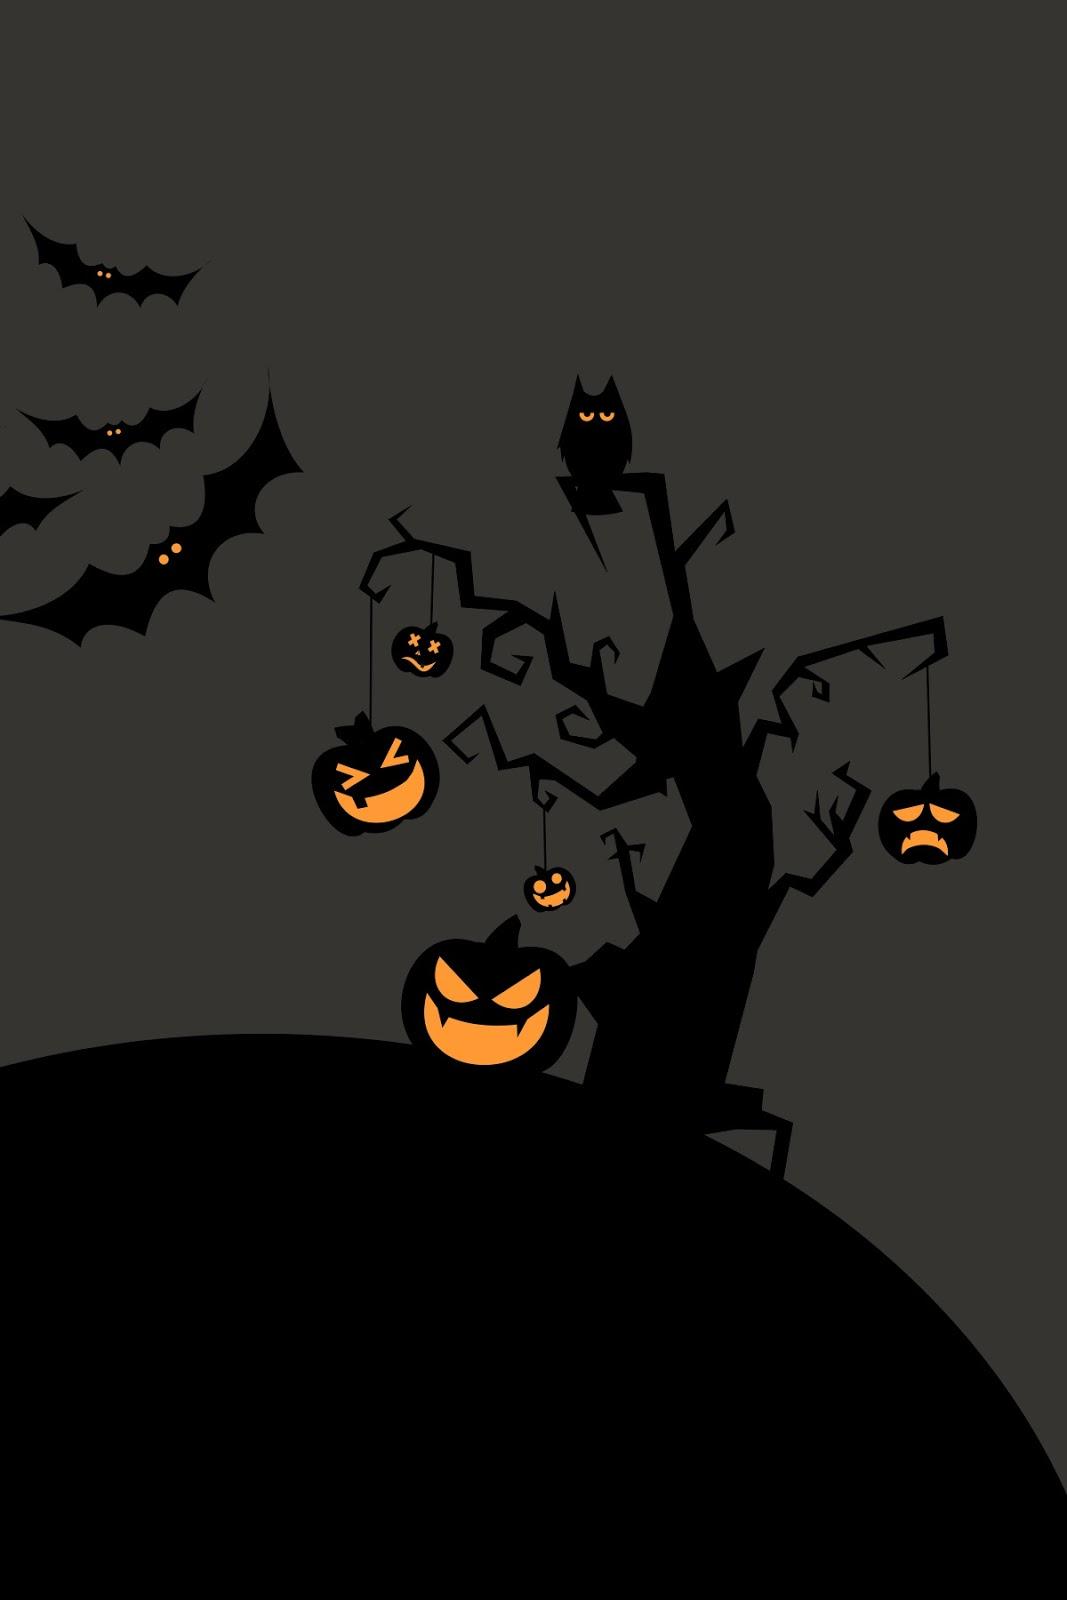 Halloween Tree pumpkin scary Wallpaper